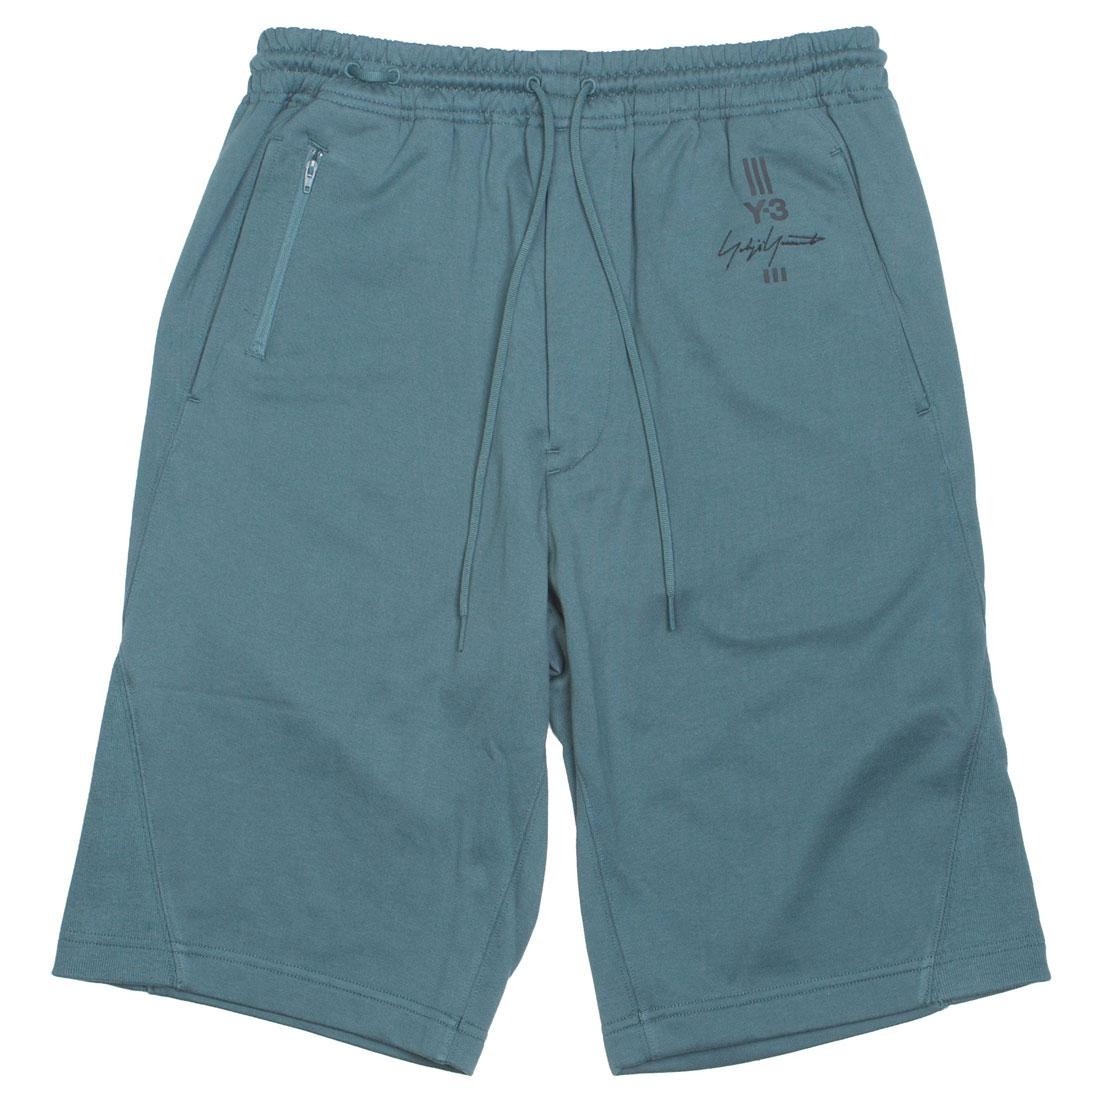 Adidas Y-3 Men New Classic Shorts (green / petrol green)